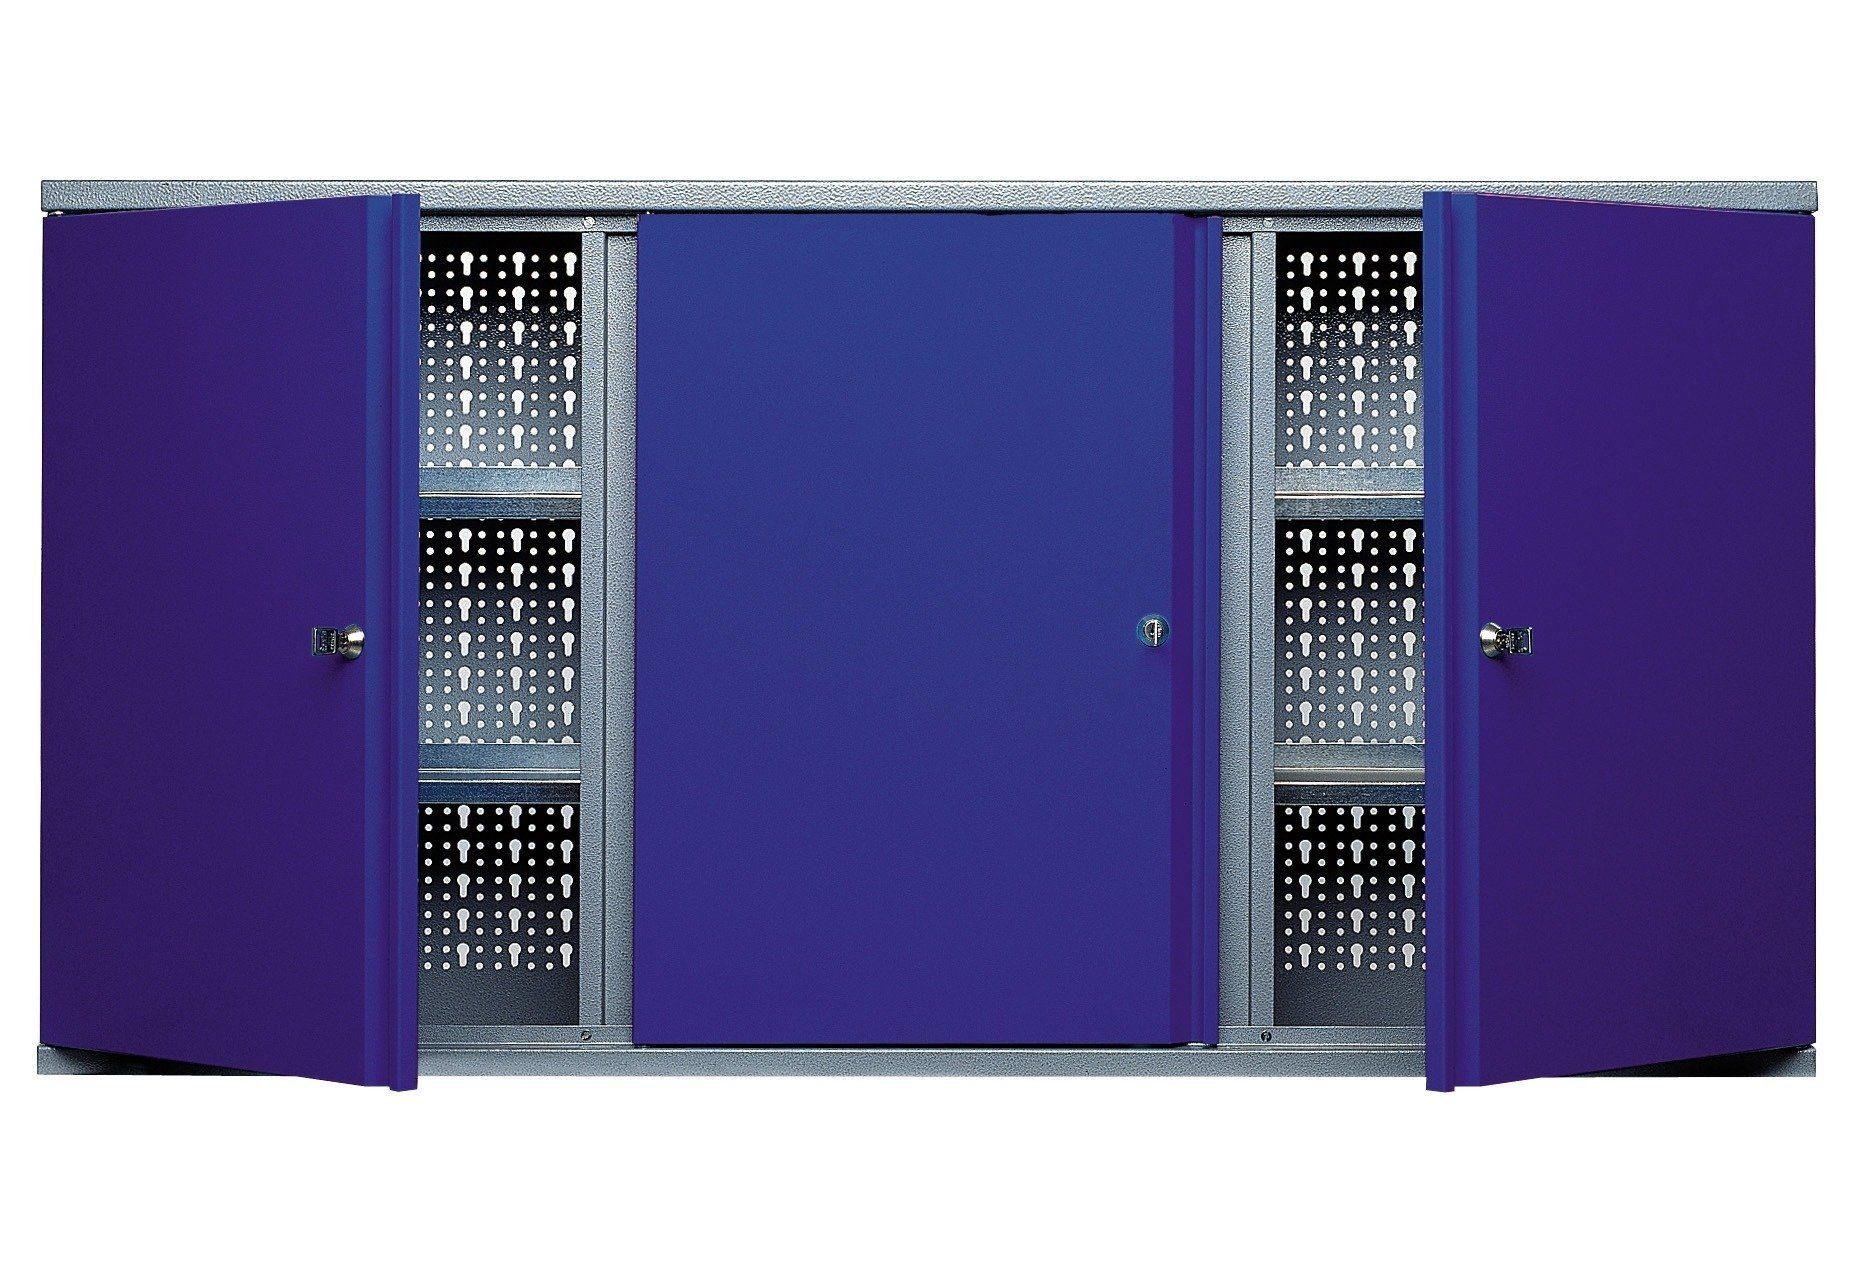 Küpper Hängeschrank »3 Türen, 4 Einlegeböden, in ultramarinblau«